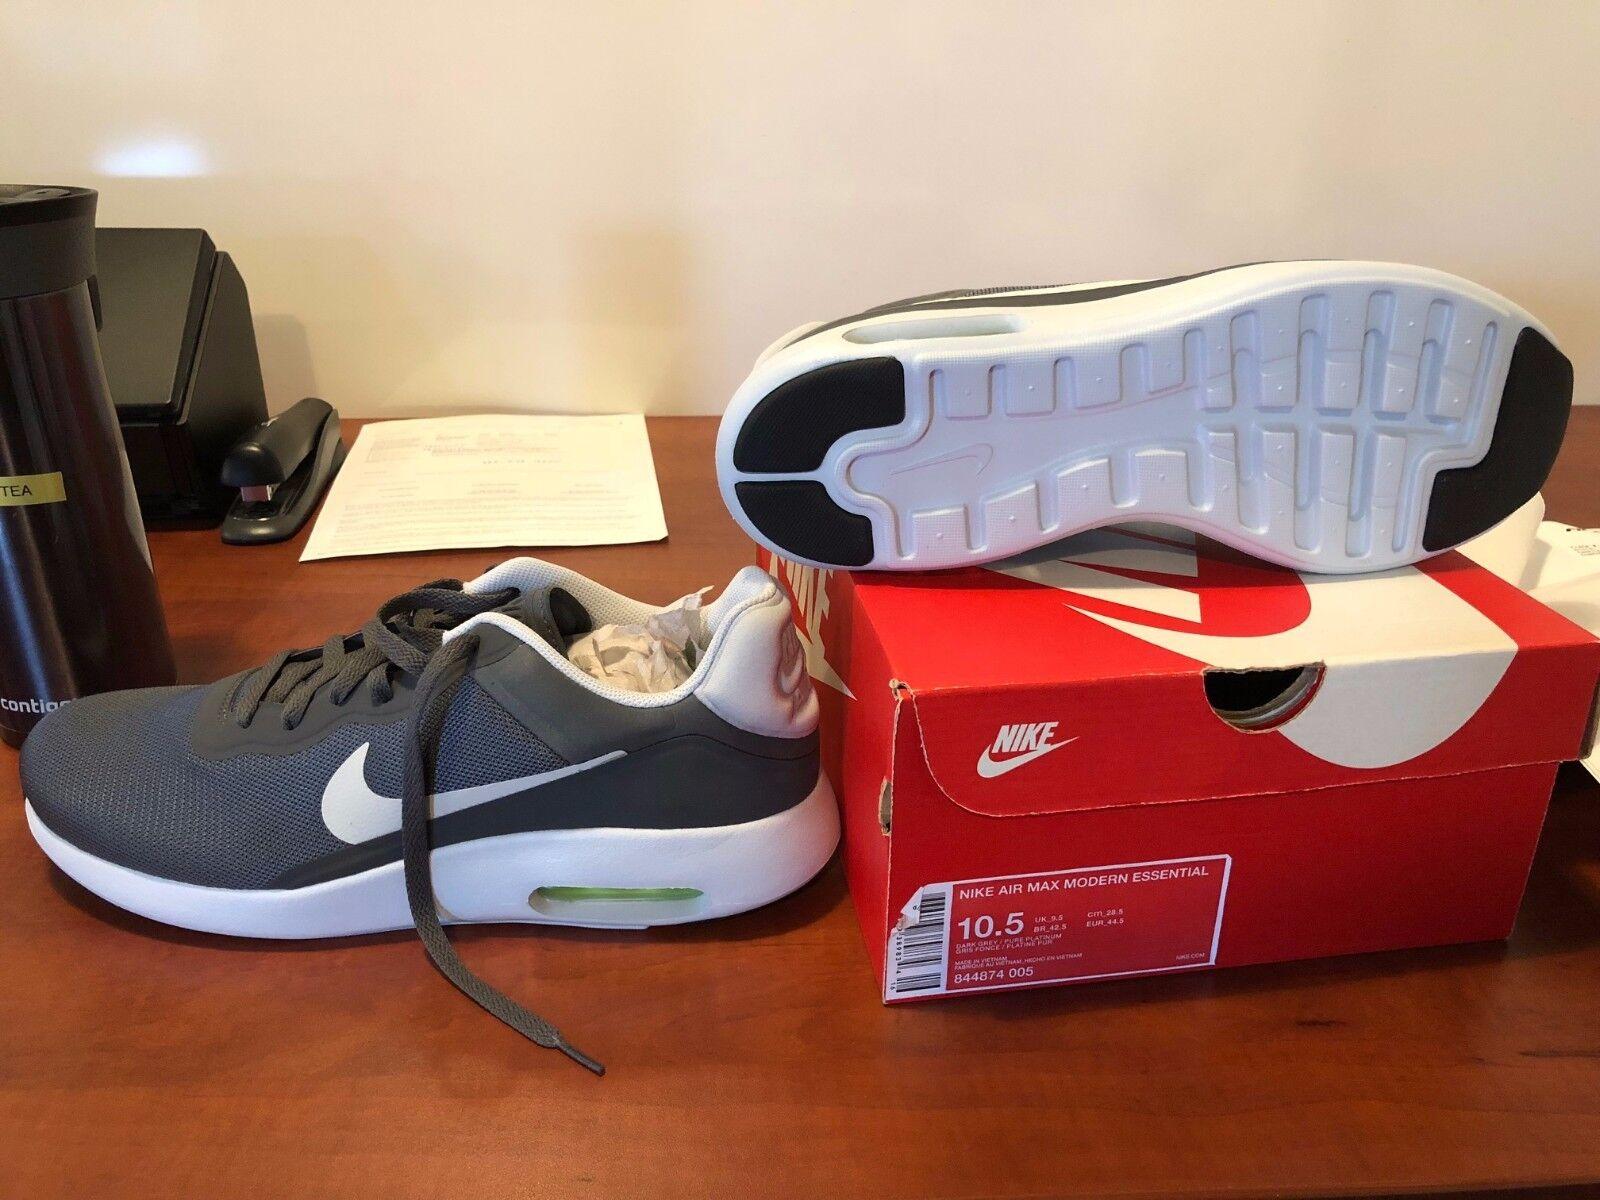 Los hombres zapatos de Nike Air Max zapatos hombres casuales zapatos de correr salvaje moderno se 5873e1